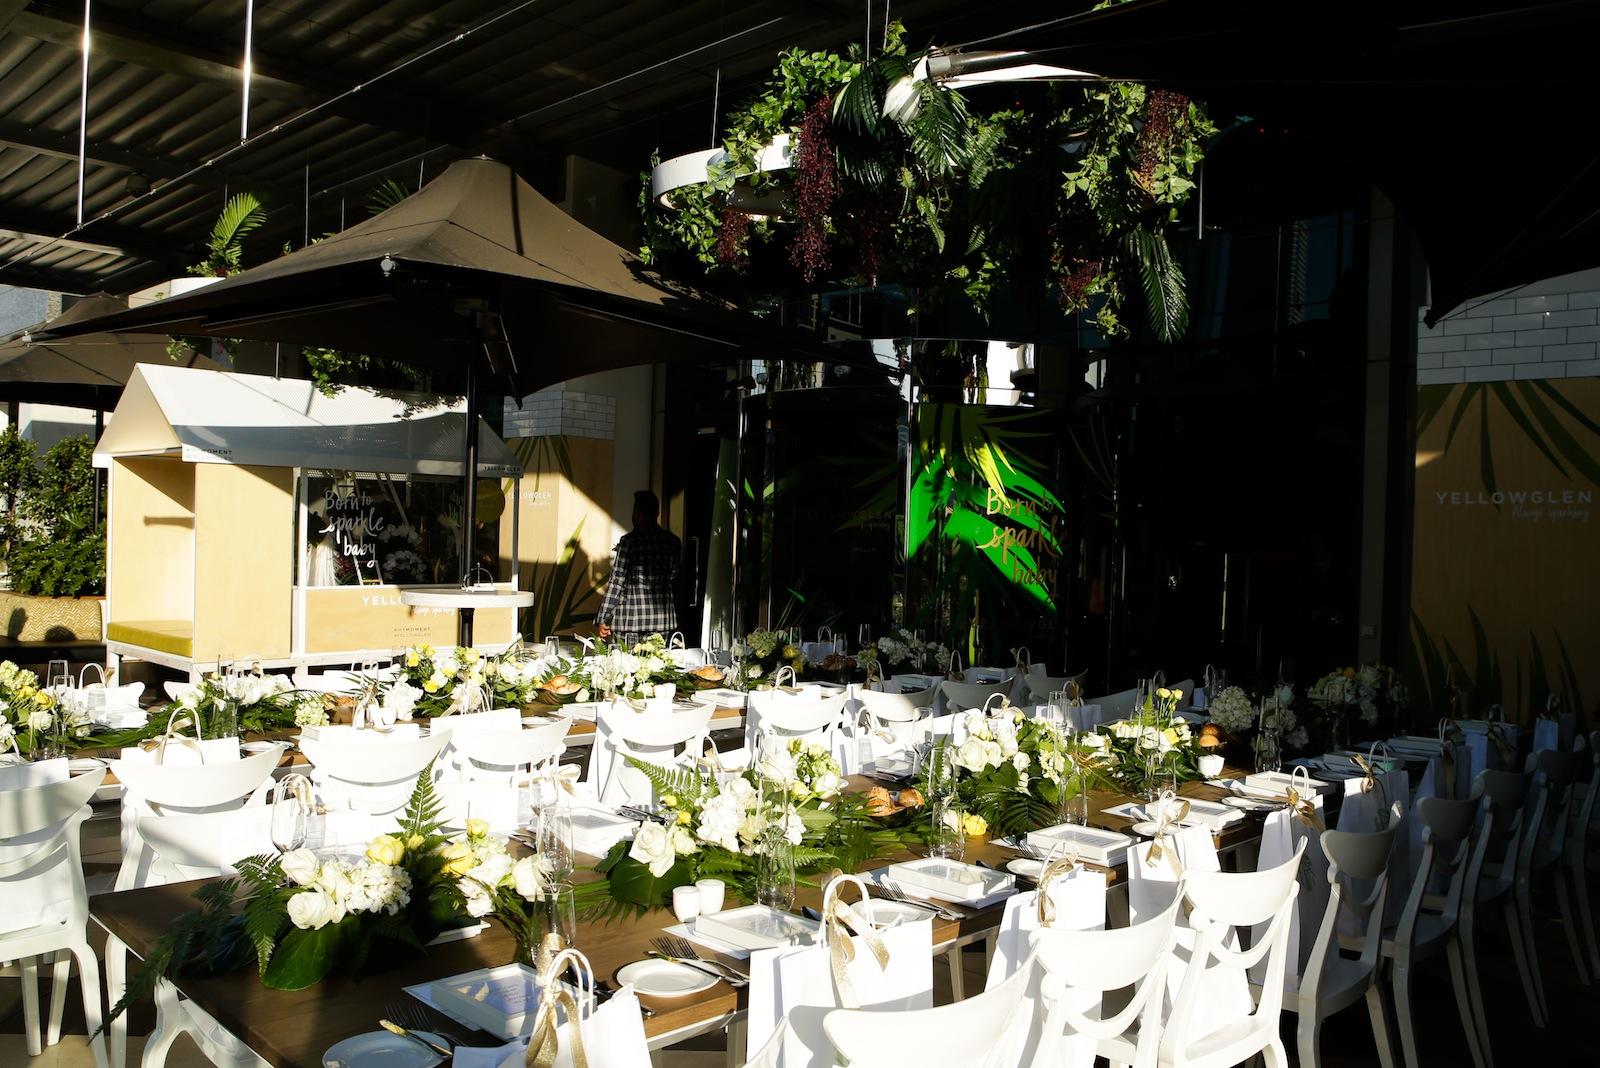 yellowglen-terrace-dinner-5.jpg